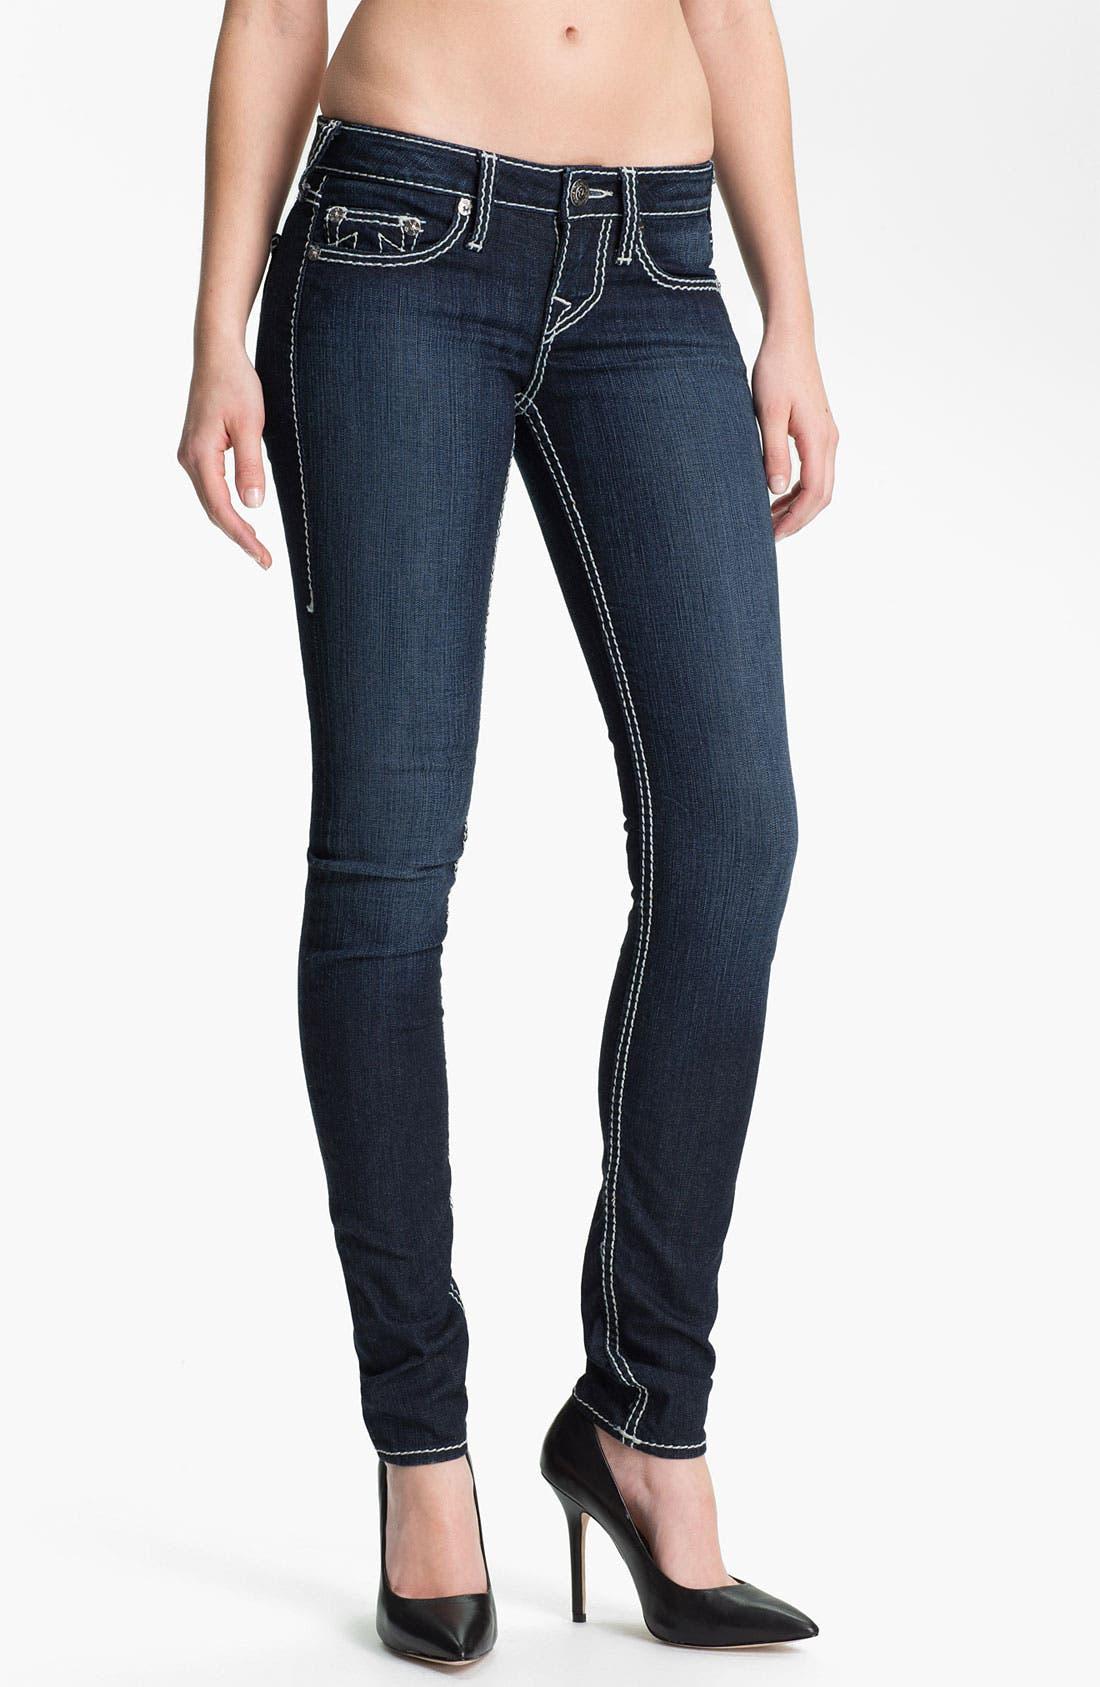 Alternate Image 1 Selected - True Religion Brand Jeans 'Stella' Skinny Stretch Jeans (Lonestar)